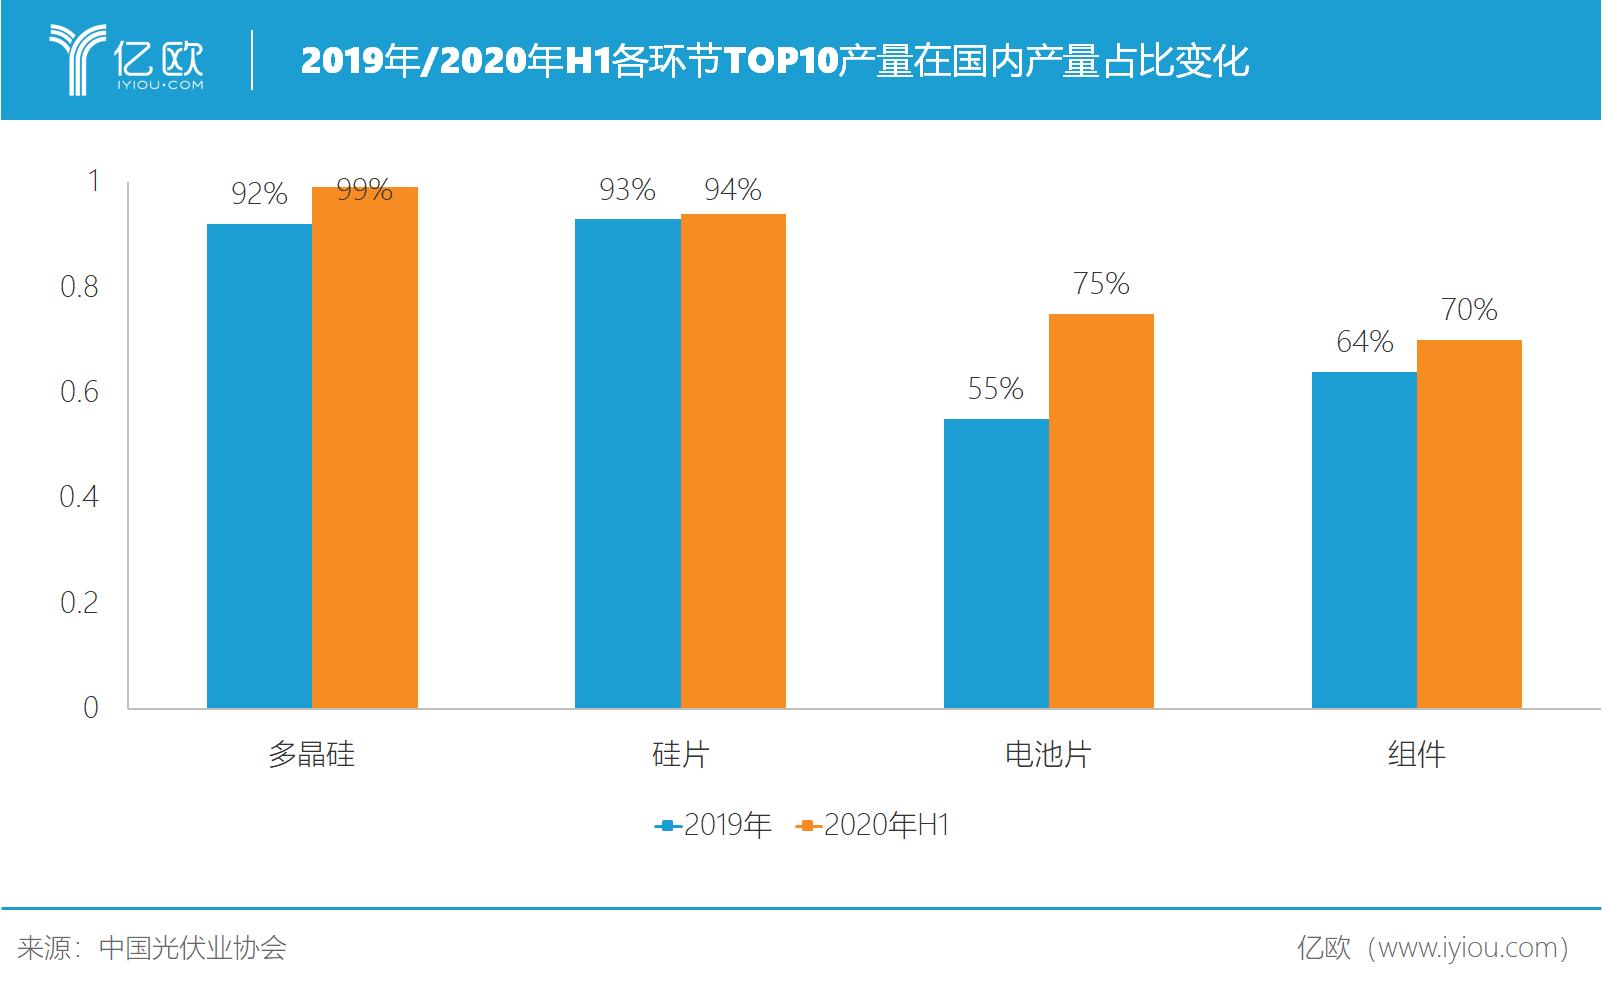 2019-2020H1各环节TOP10产量占比.png